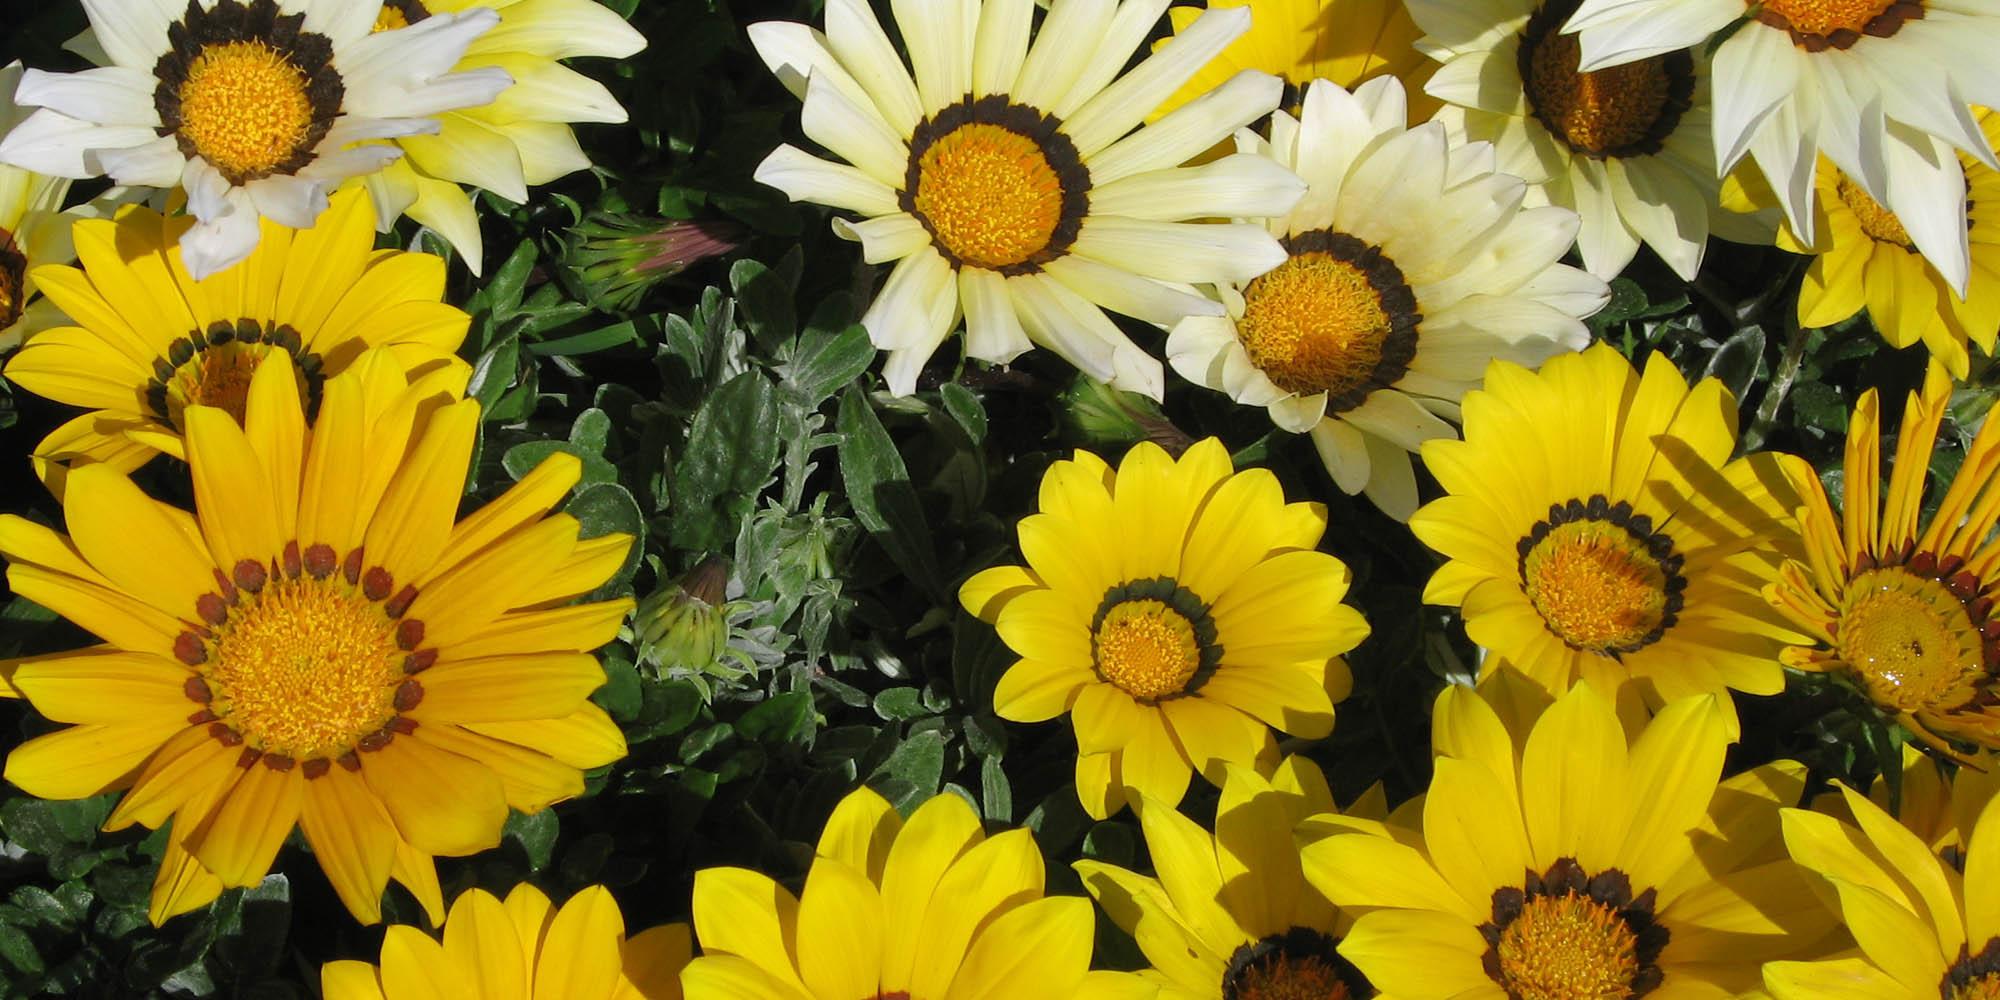 midi-oliven-flower-yell Kopie.jpg